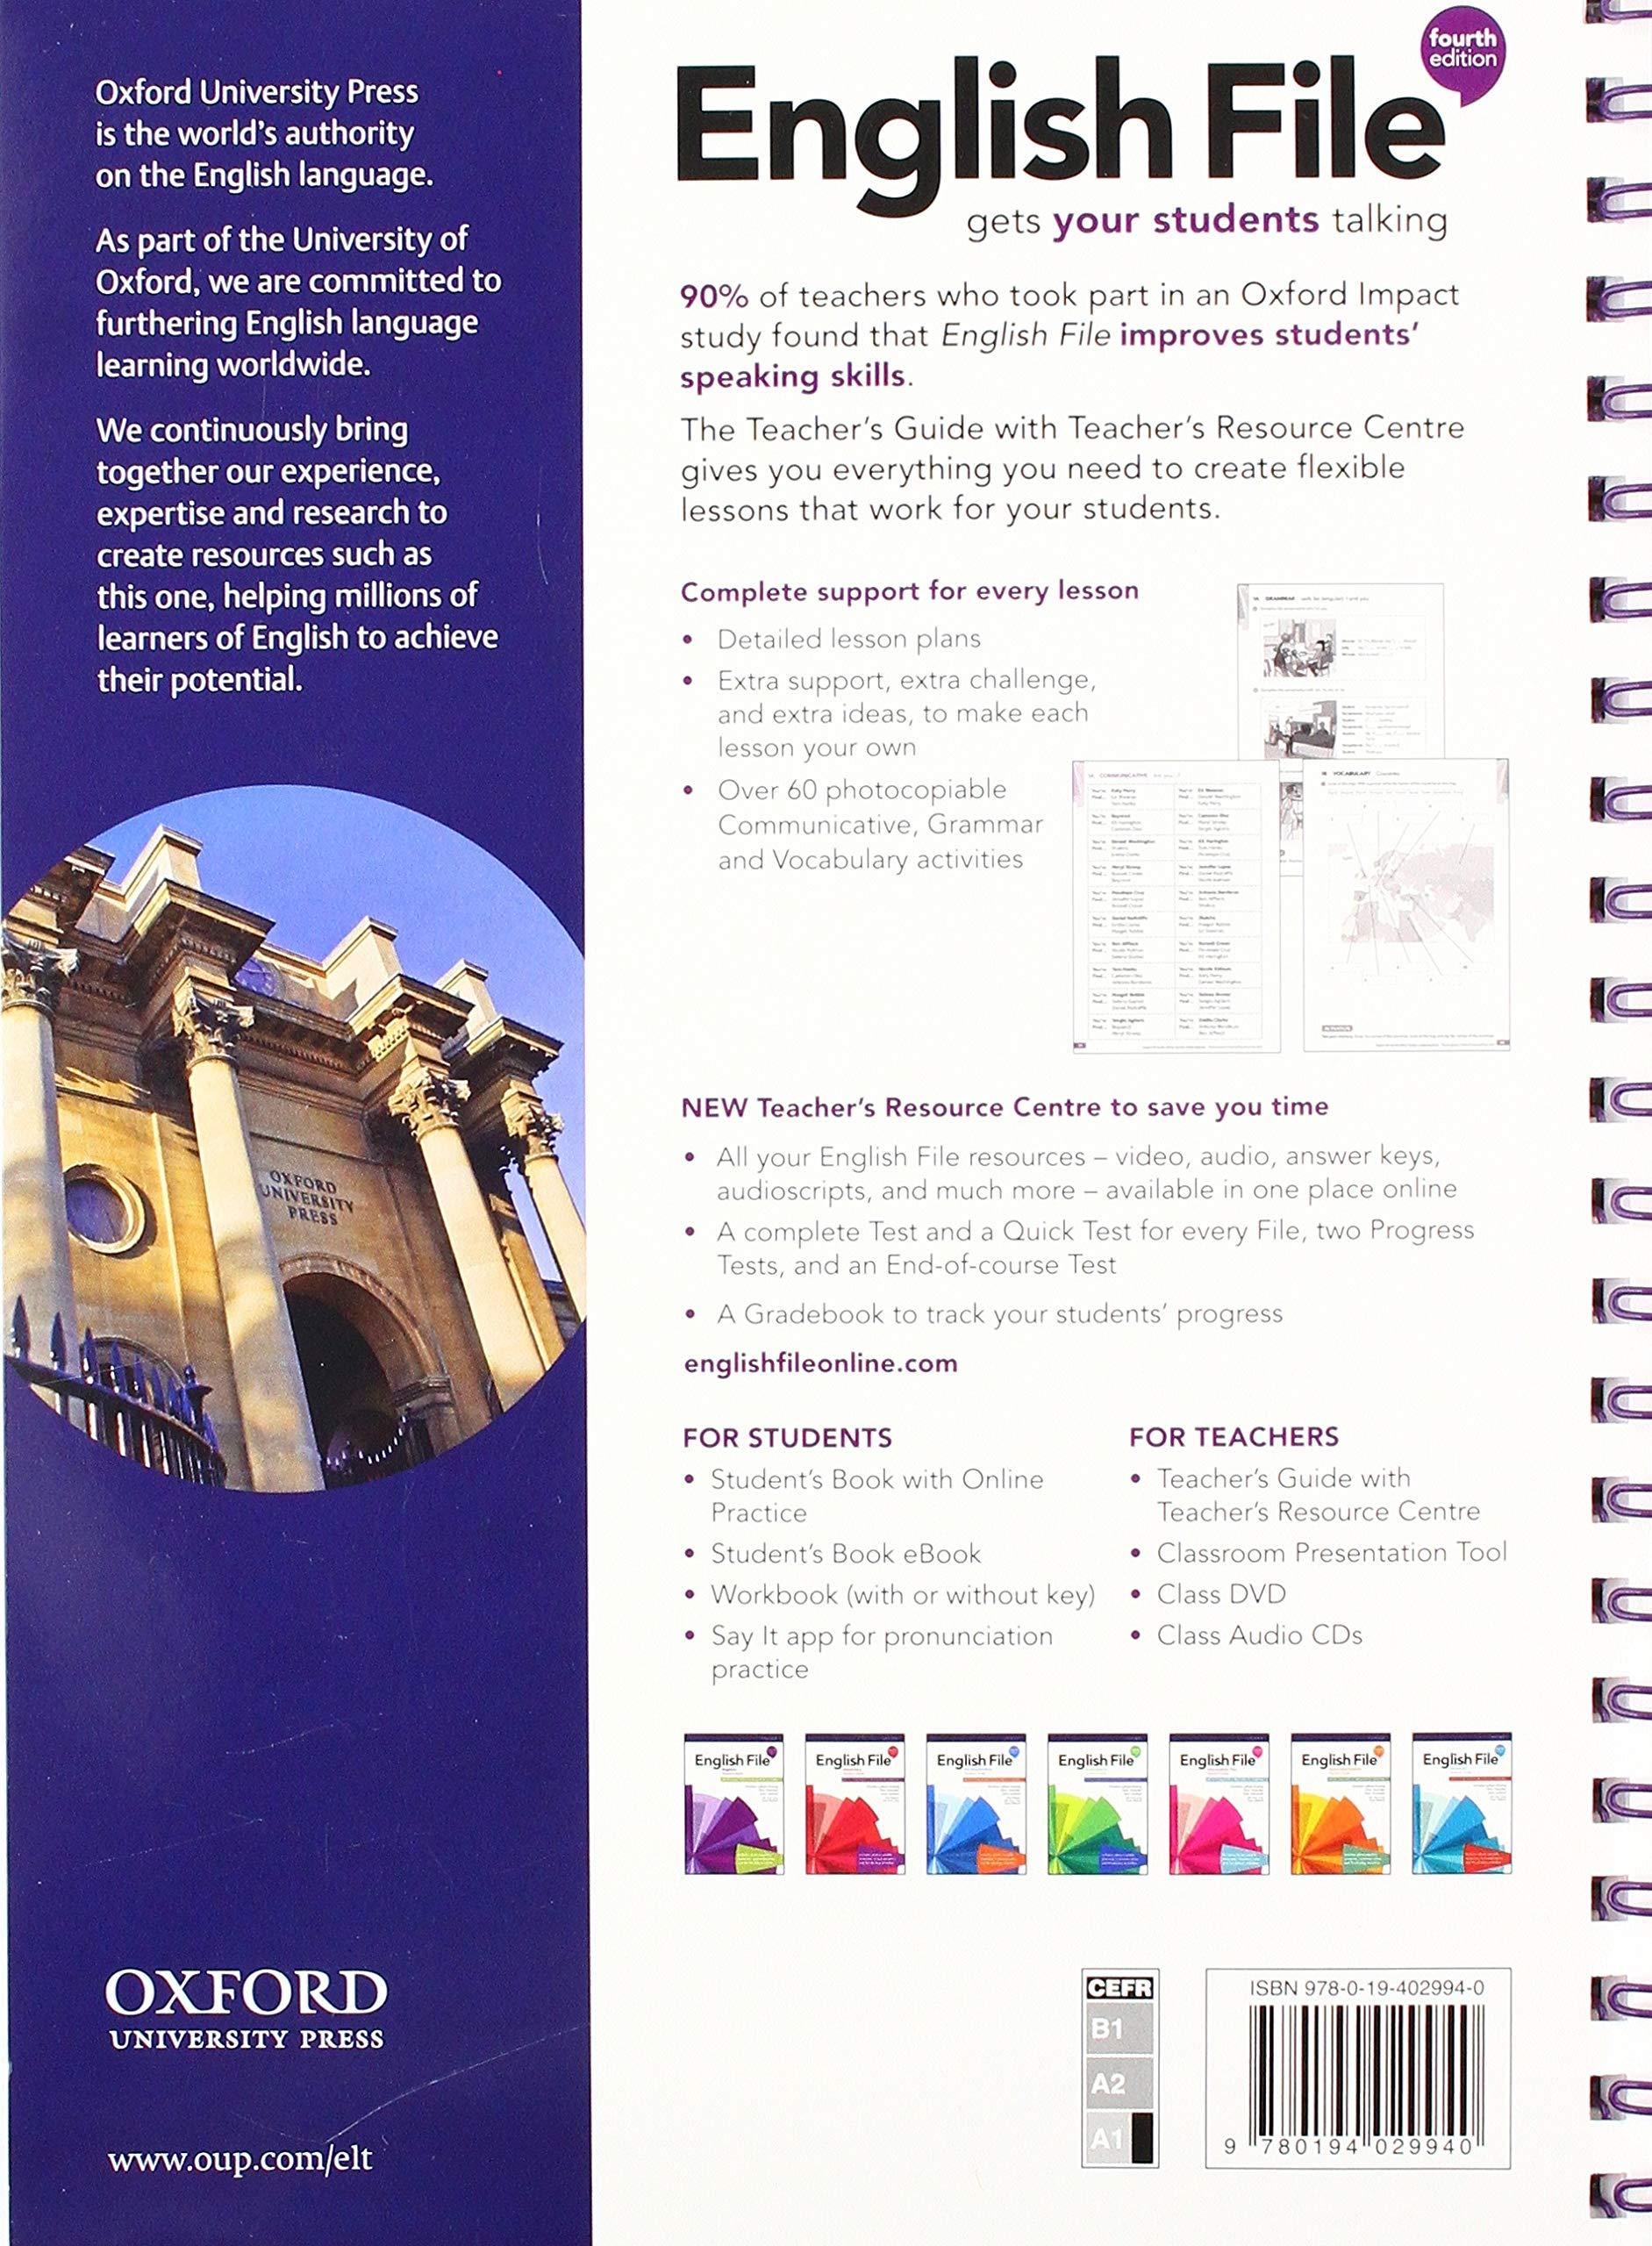 English File Beginner Teachers Guide with Teachers Resource ...